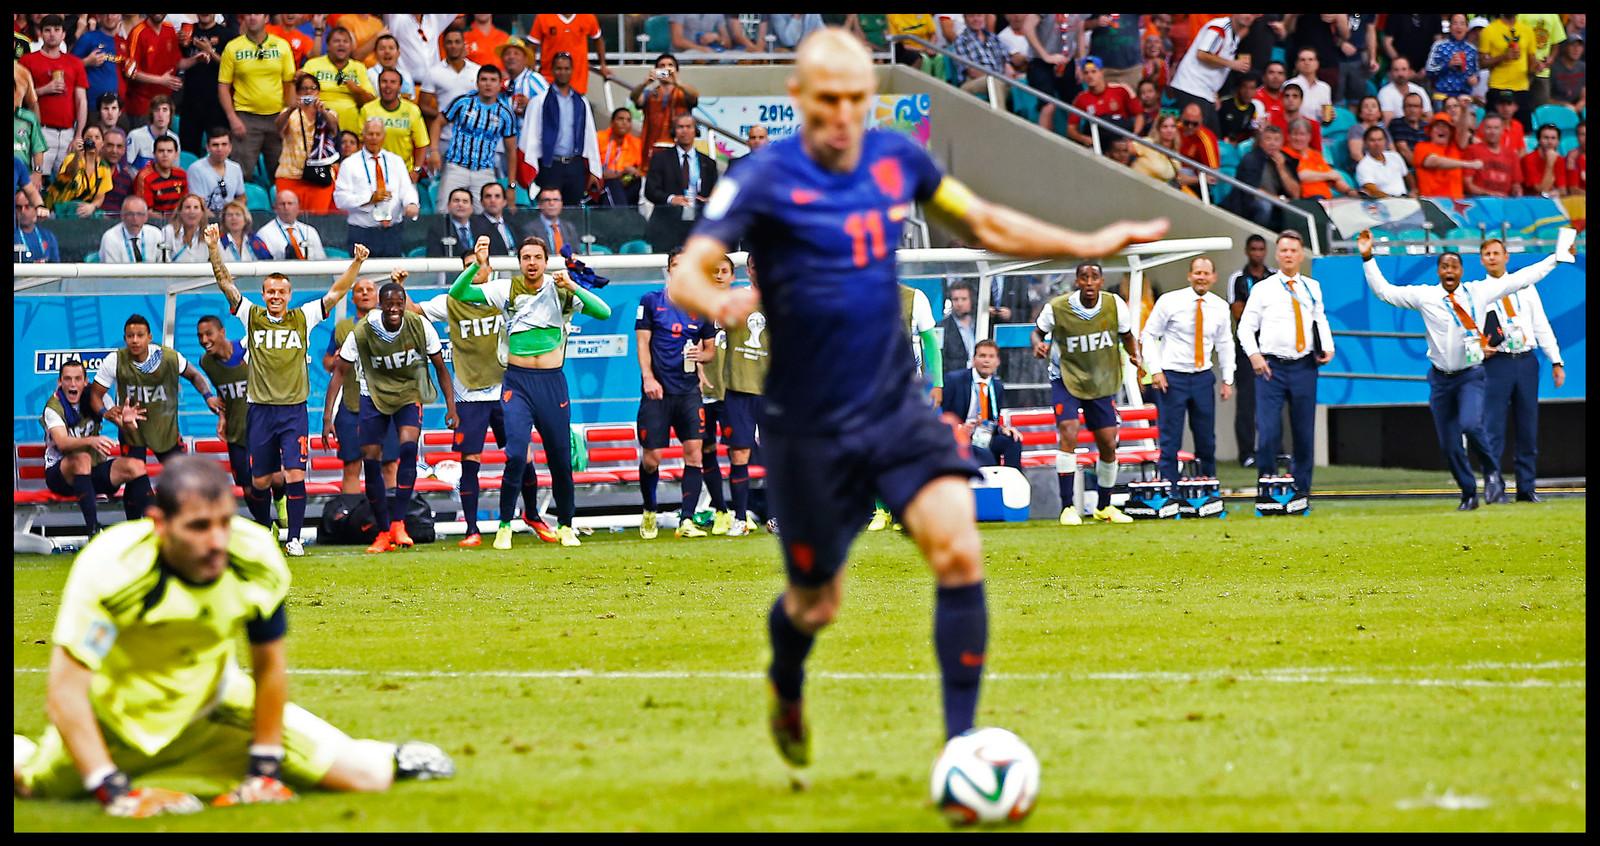 Arjen Robben passeert Iker Casillas en is op weg naar de 5-1!